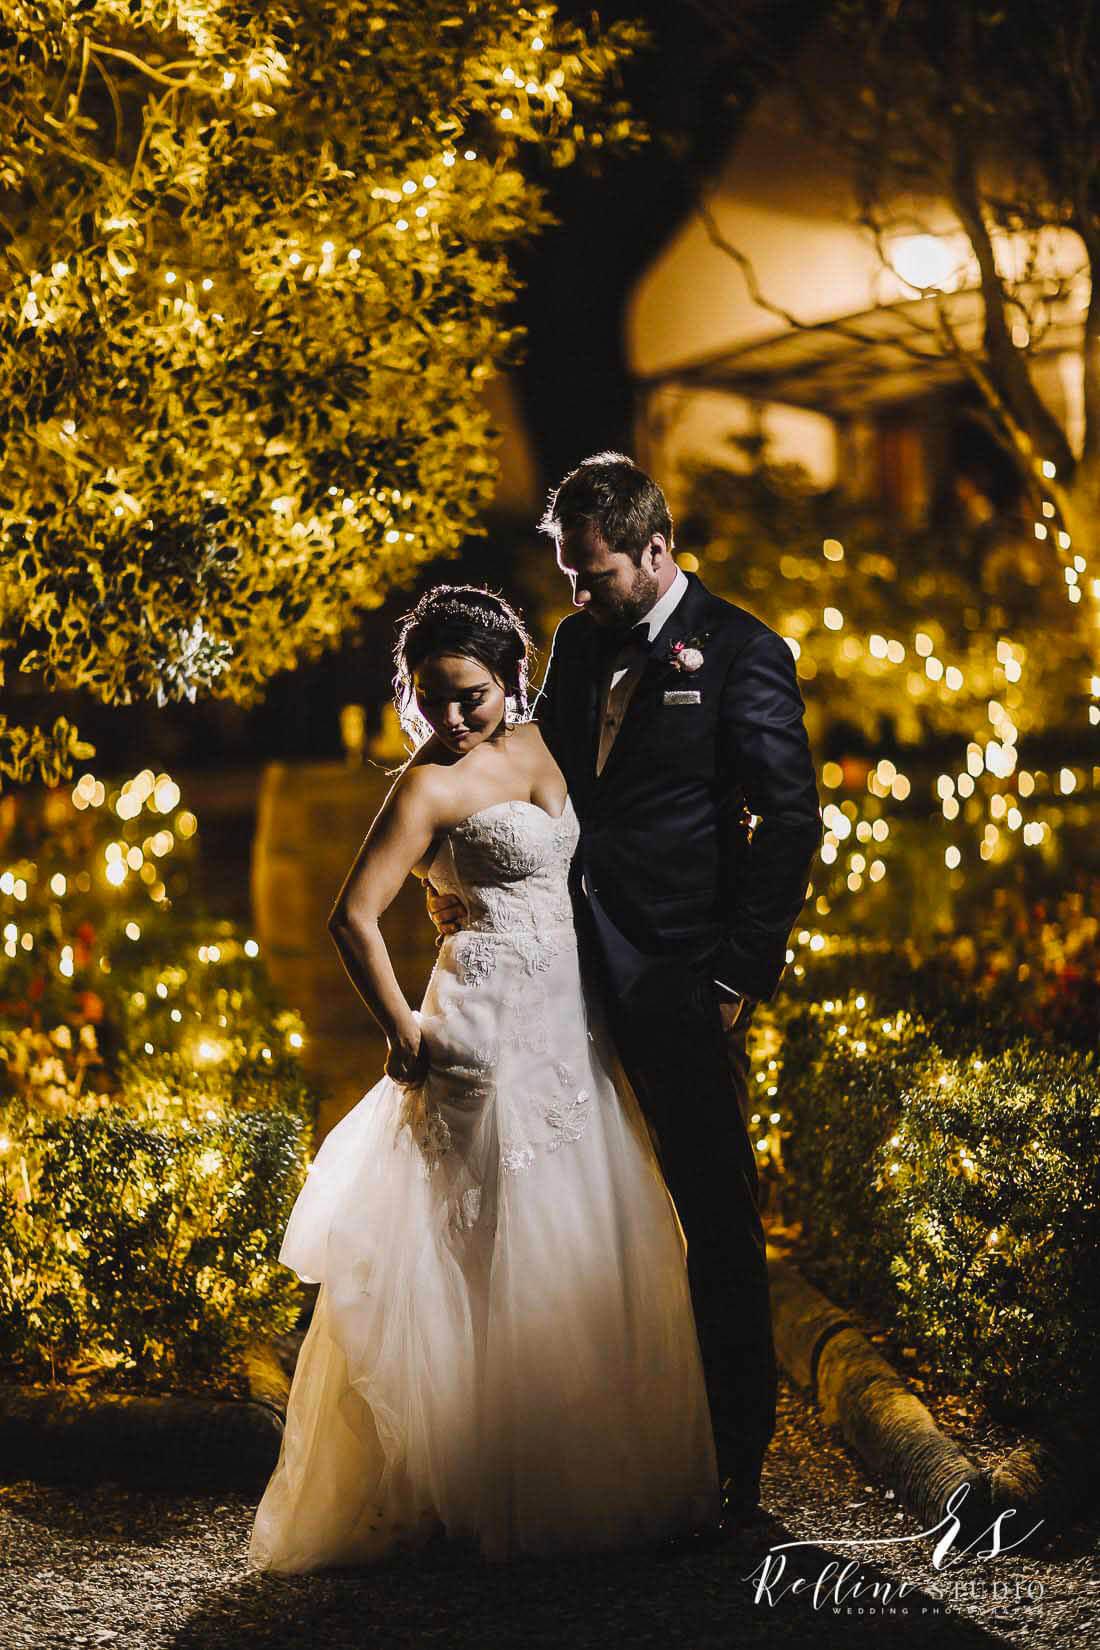 wedding reception in Italy